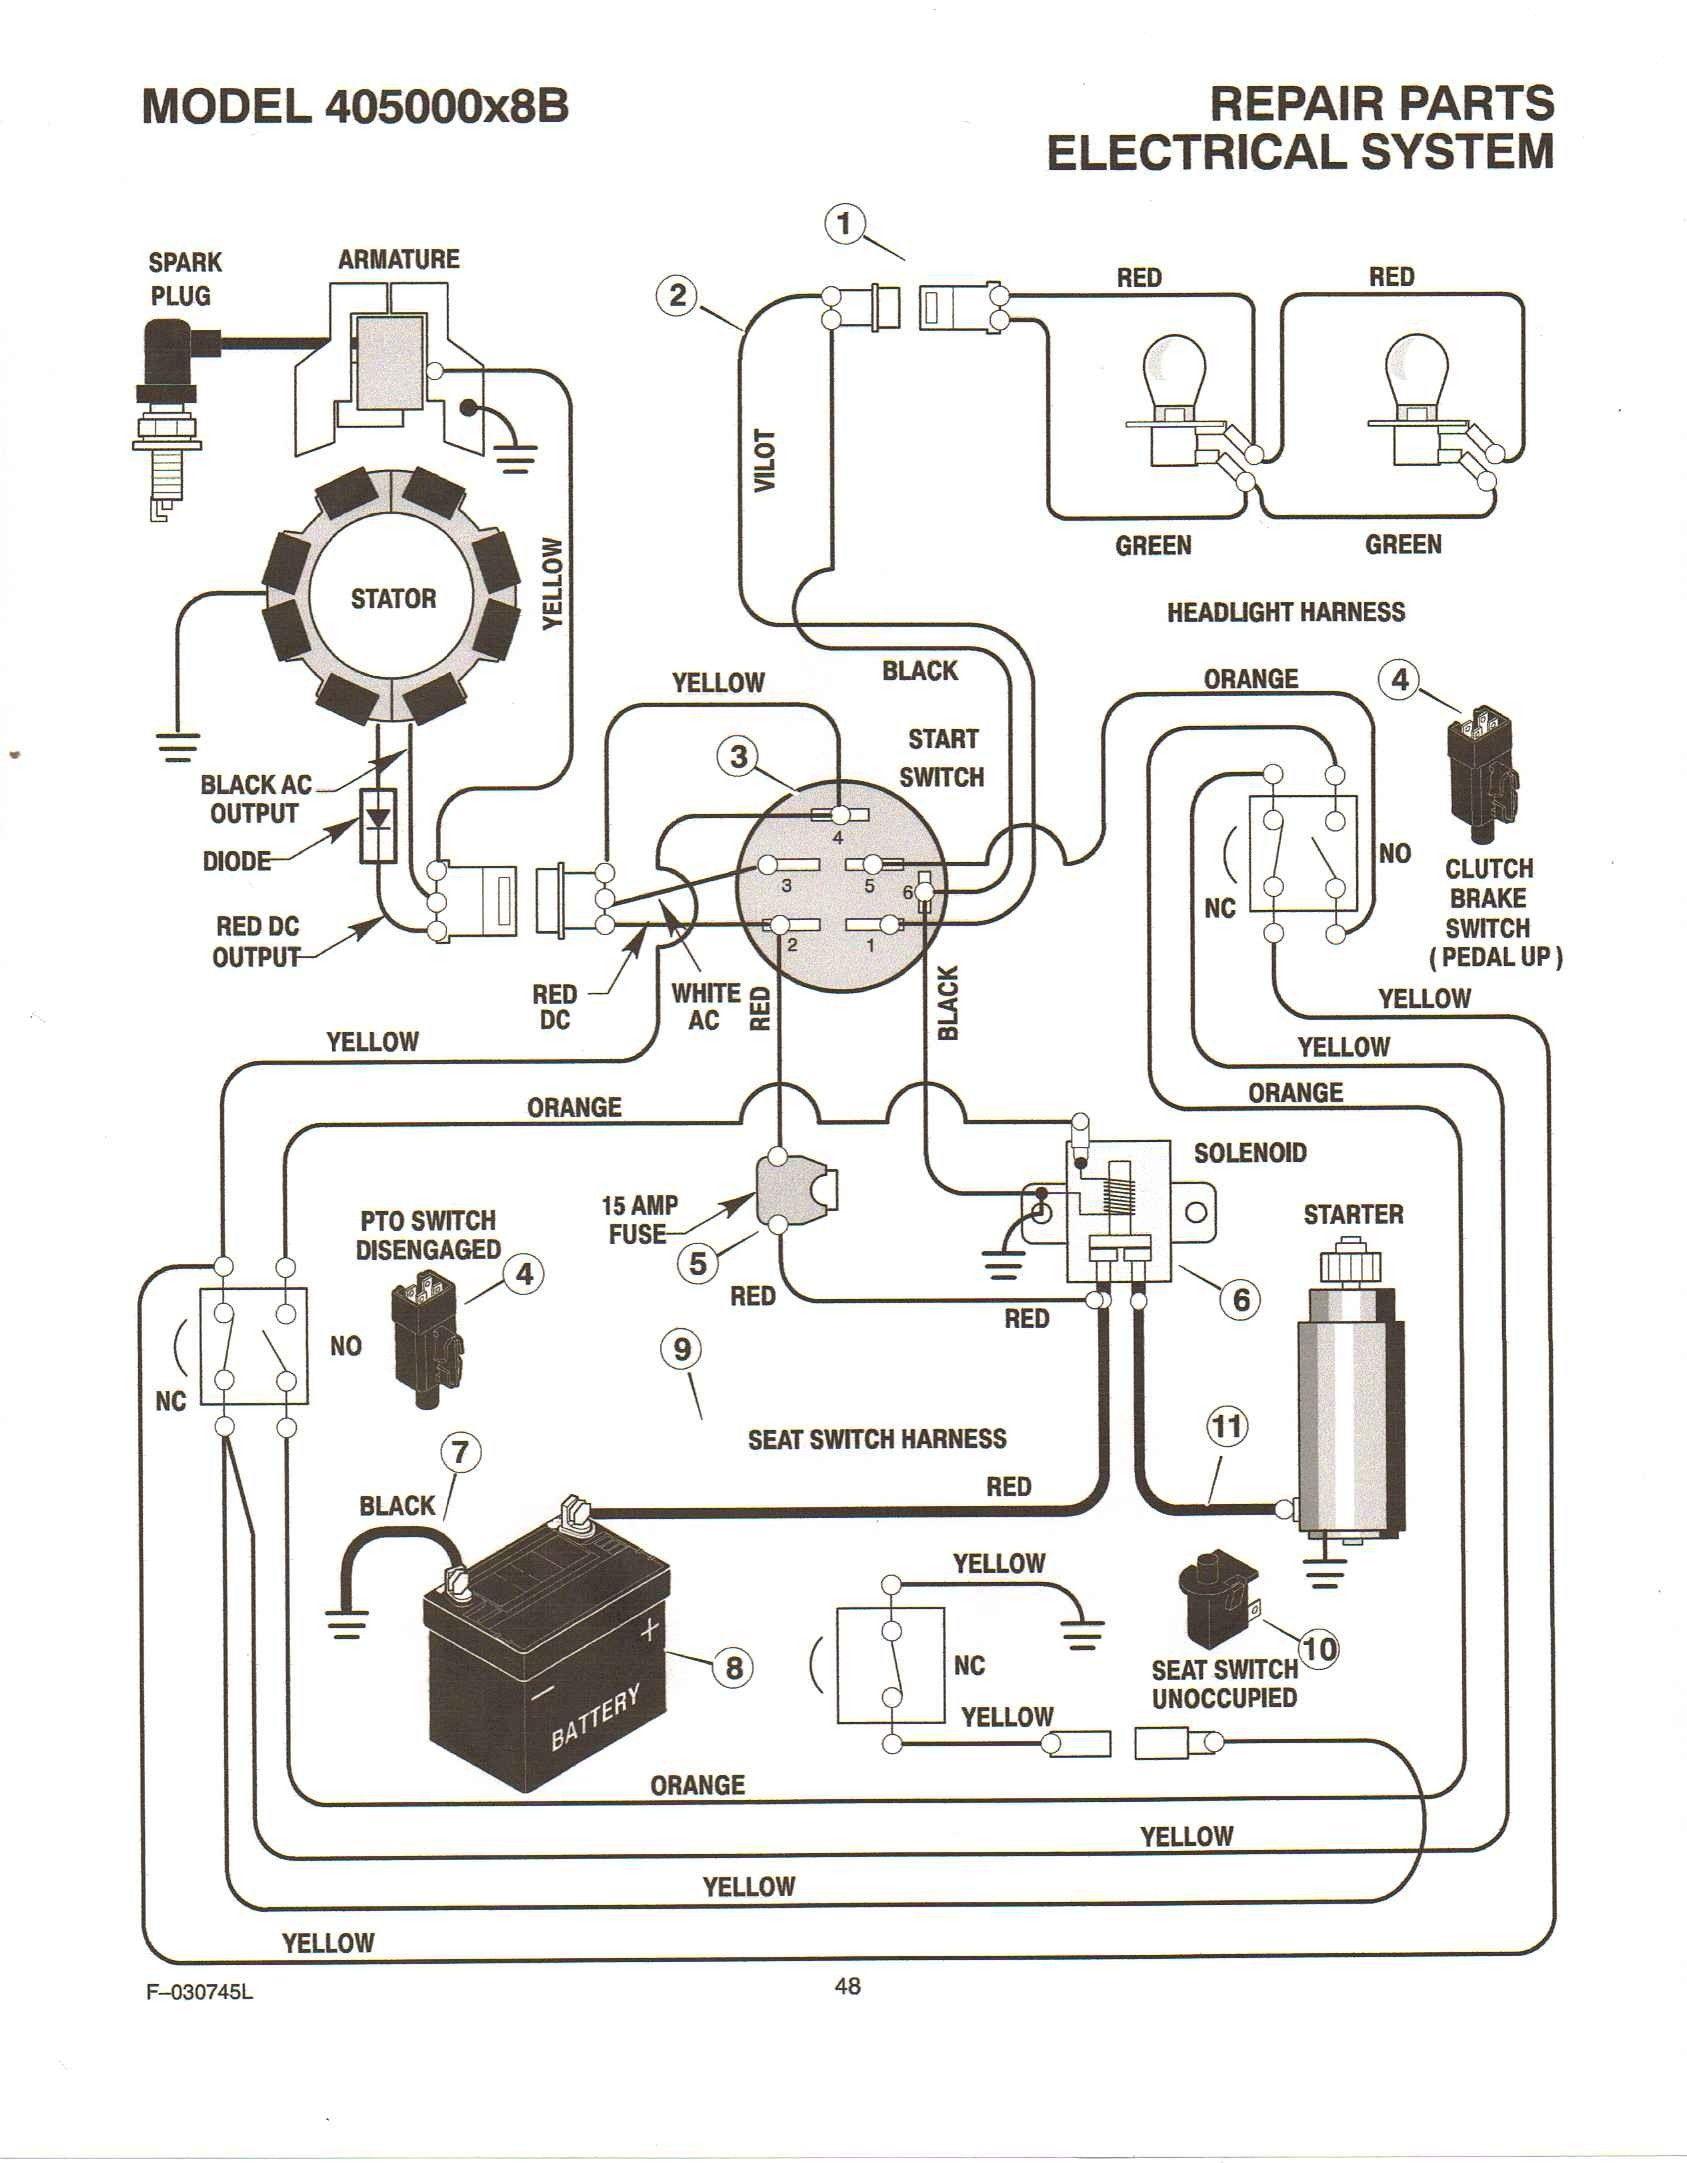 Kohler Engine Diagram in 2021   Electrical diagram, Diagram, Kohler engines   Group Engine Diagram      Pinterest